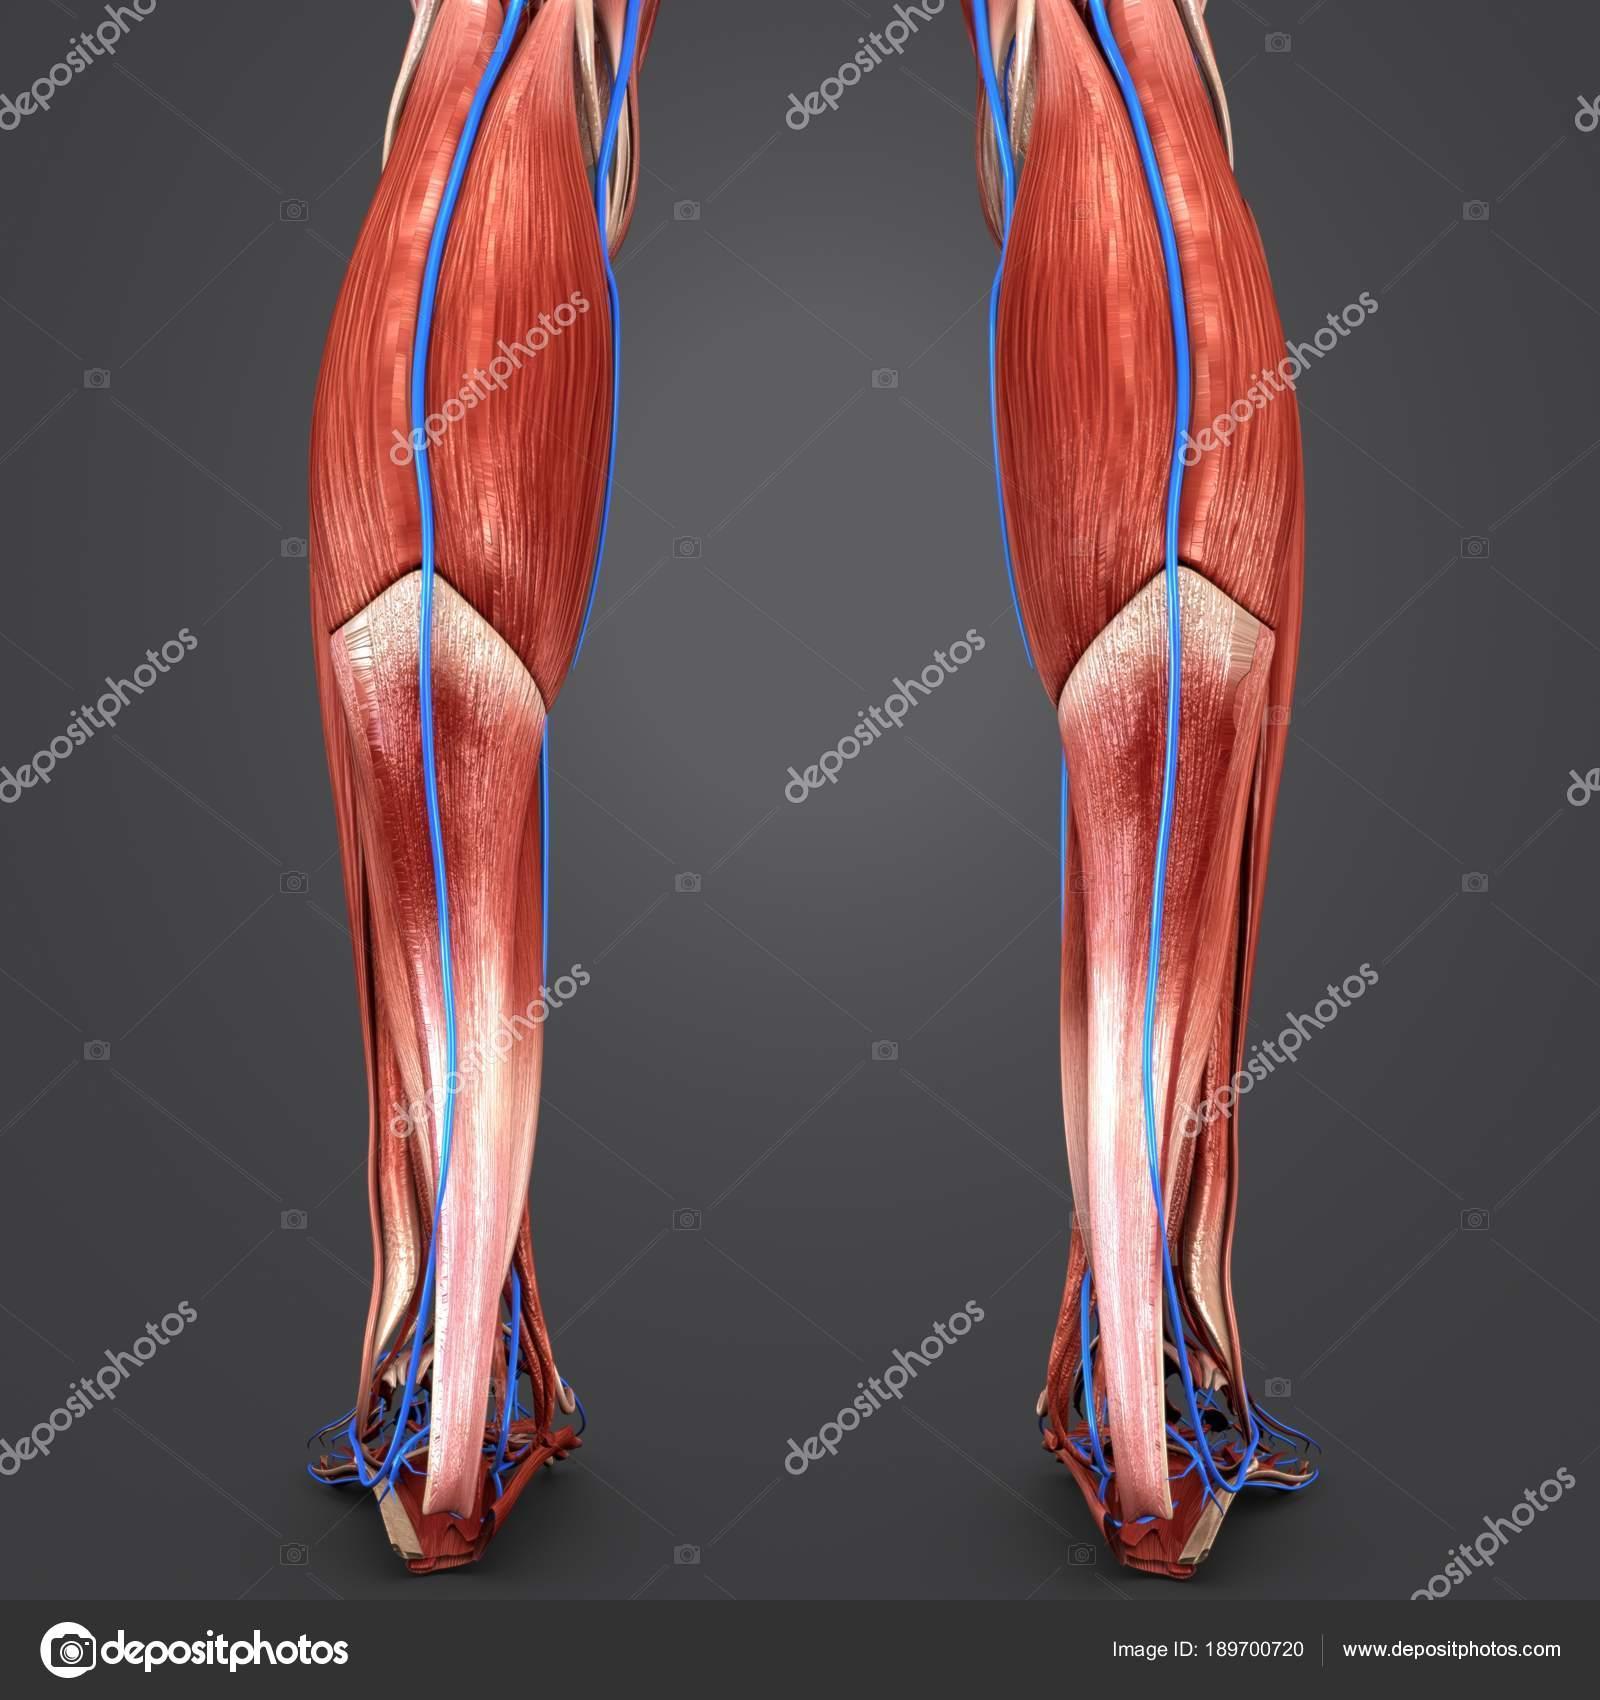 Colorful Medical Illustration Human Legs Veins — Stock Photo ...